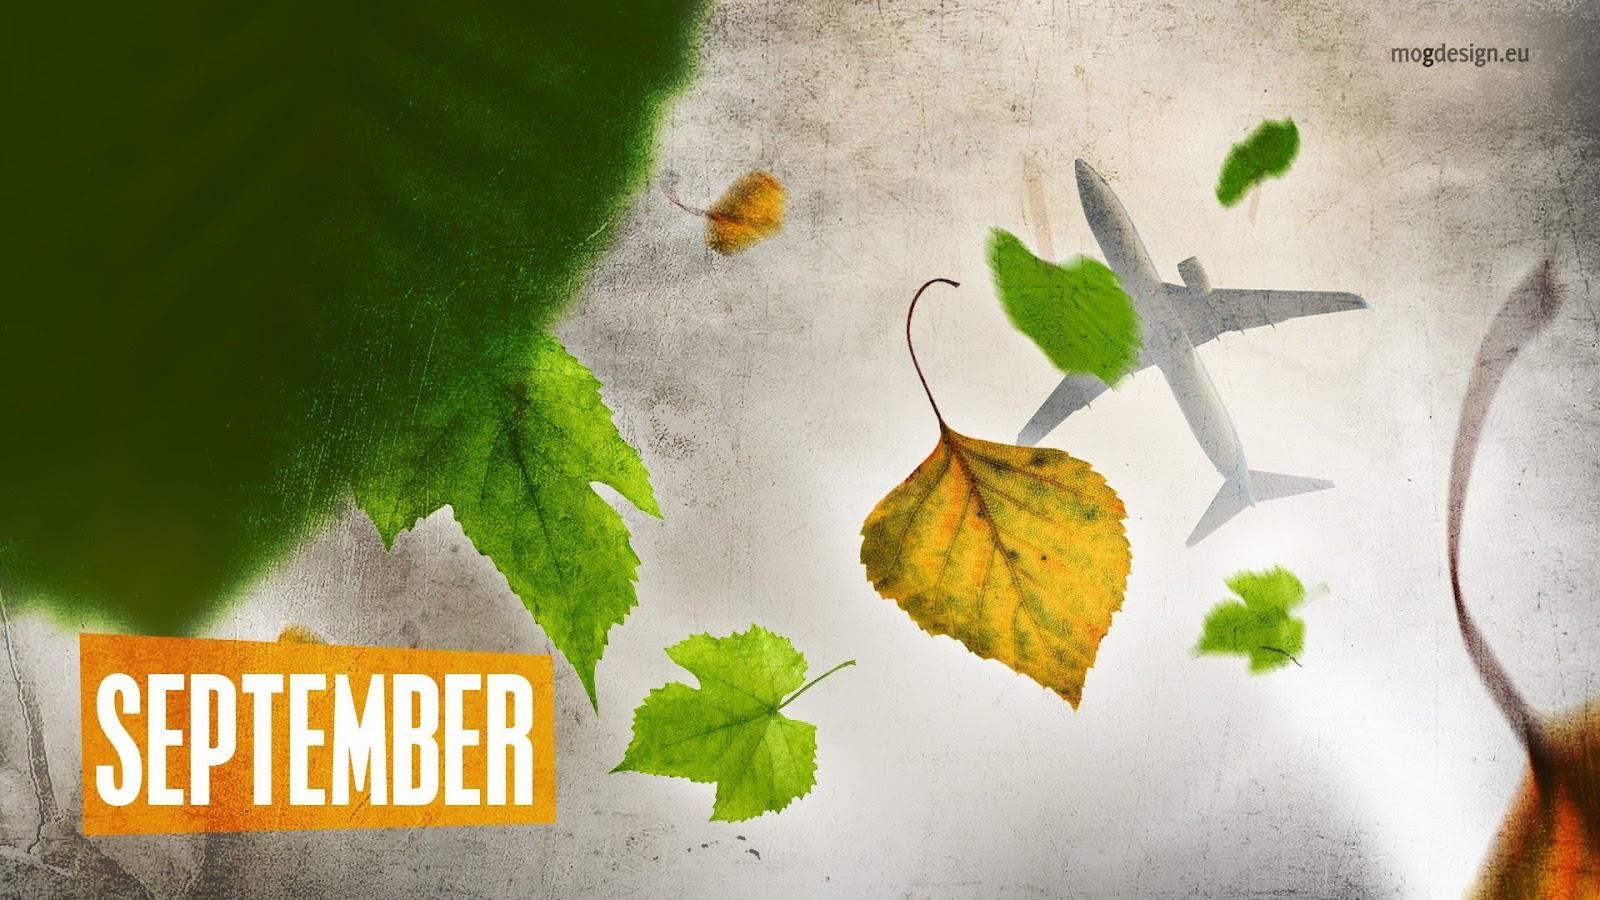 http://2.bp.blogspot.com/-vAhZvBhMxkE/UE20dF1S8RI/AAAAAAAAGFY/JB_P-DCCJM4/s1600/autumn_september_sky-1920x1080.jpg